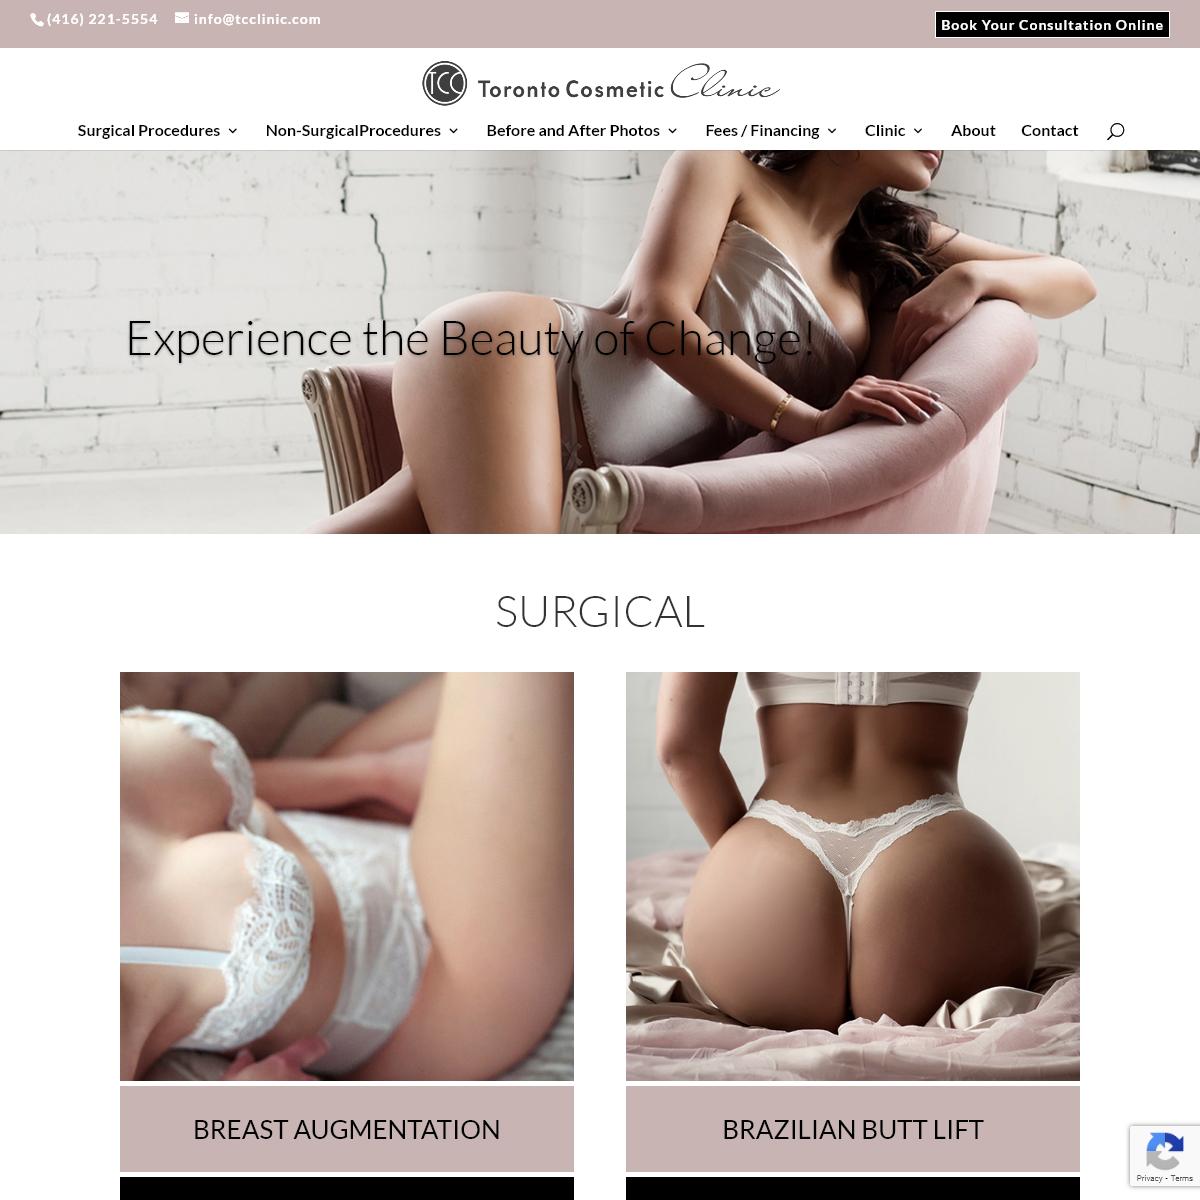 Toronto Cosmetic Clinic - Plastic Surgery - Non Surgical Procedure - TCC